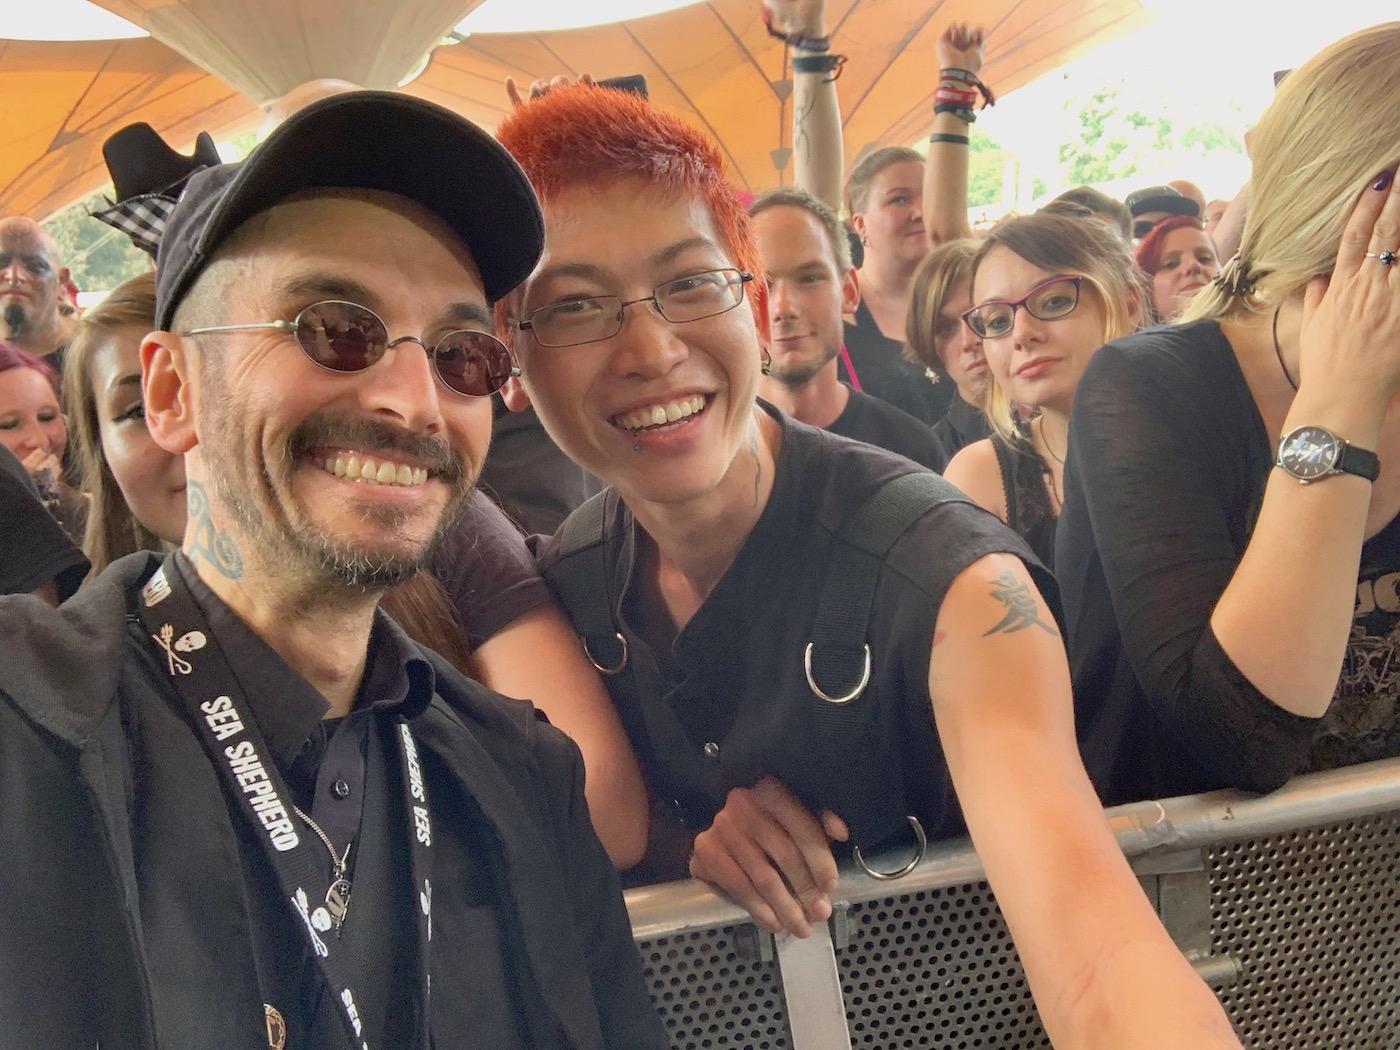 mark_benecke_amphi_festival_koeln_2019 - 42.jpg